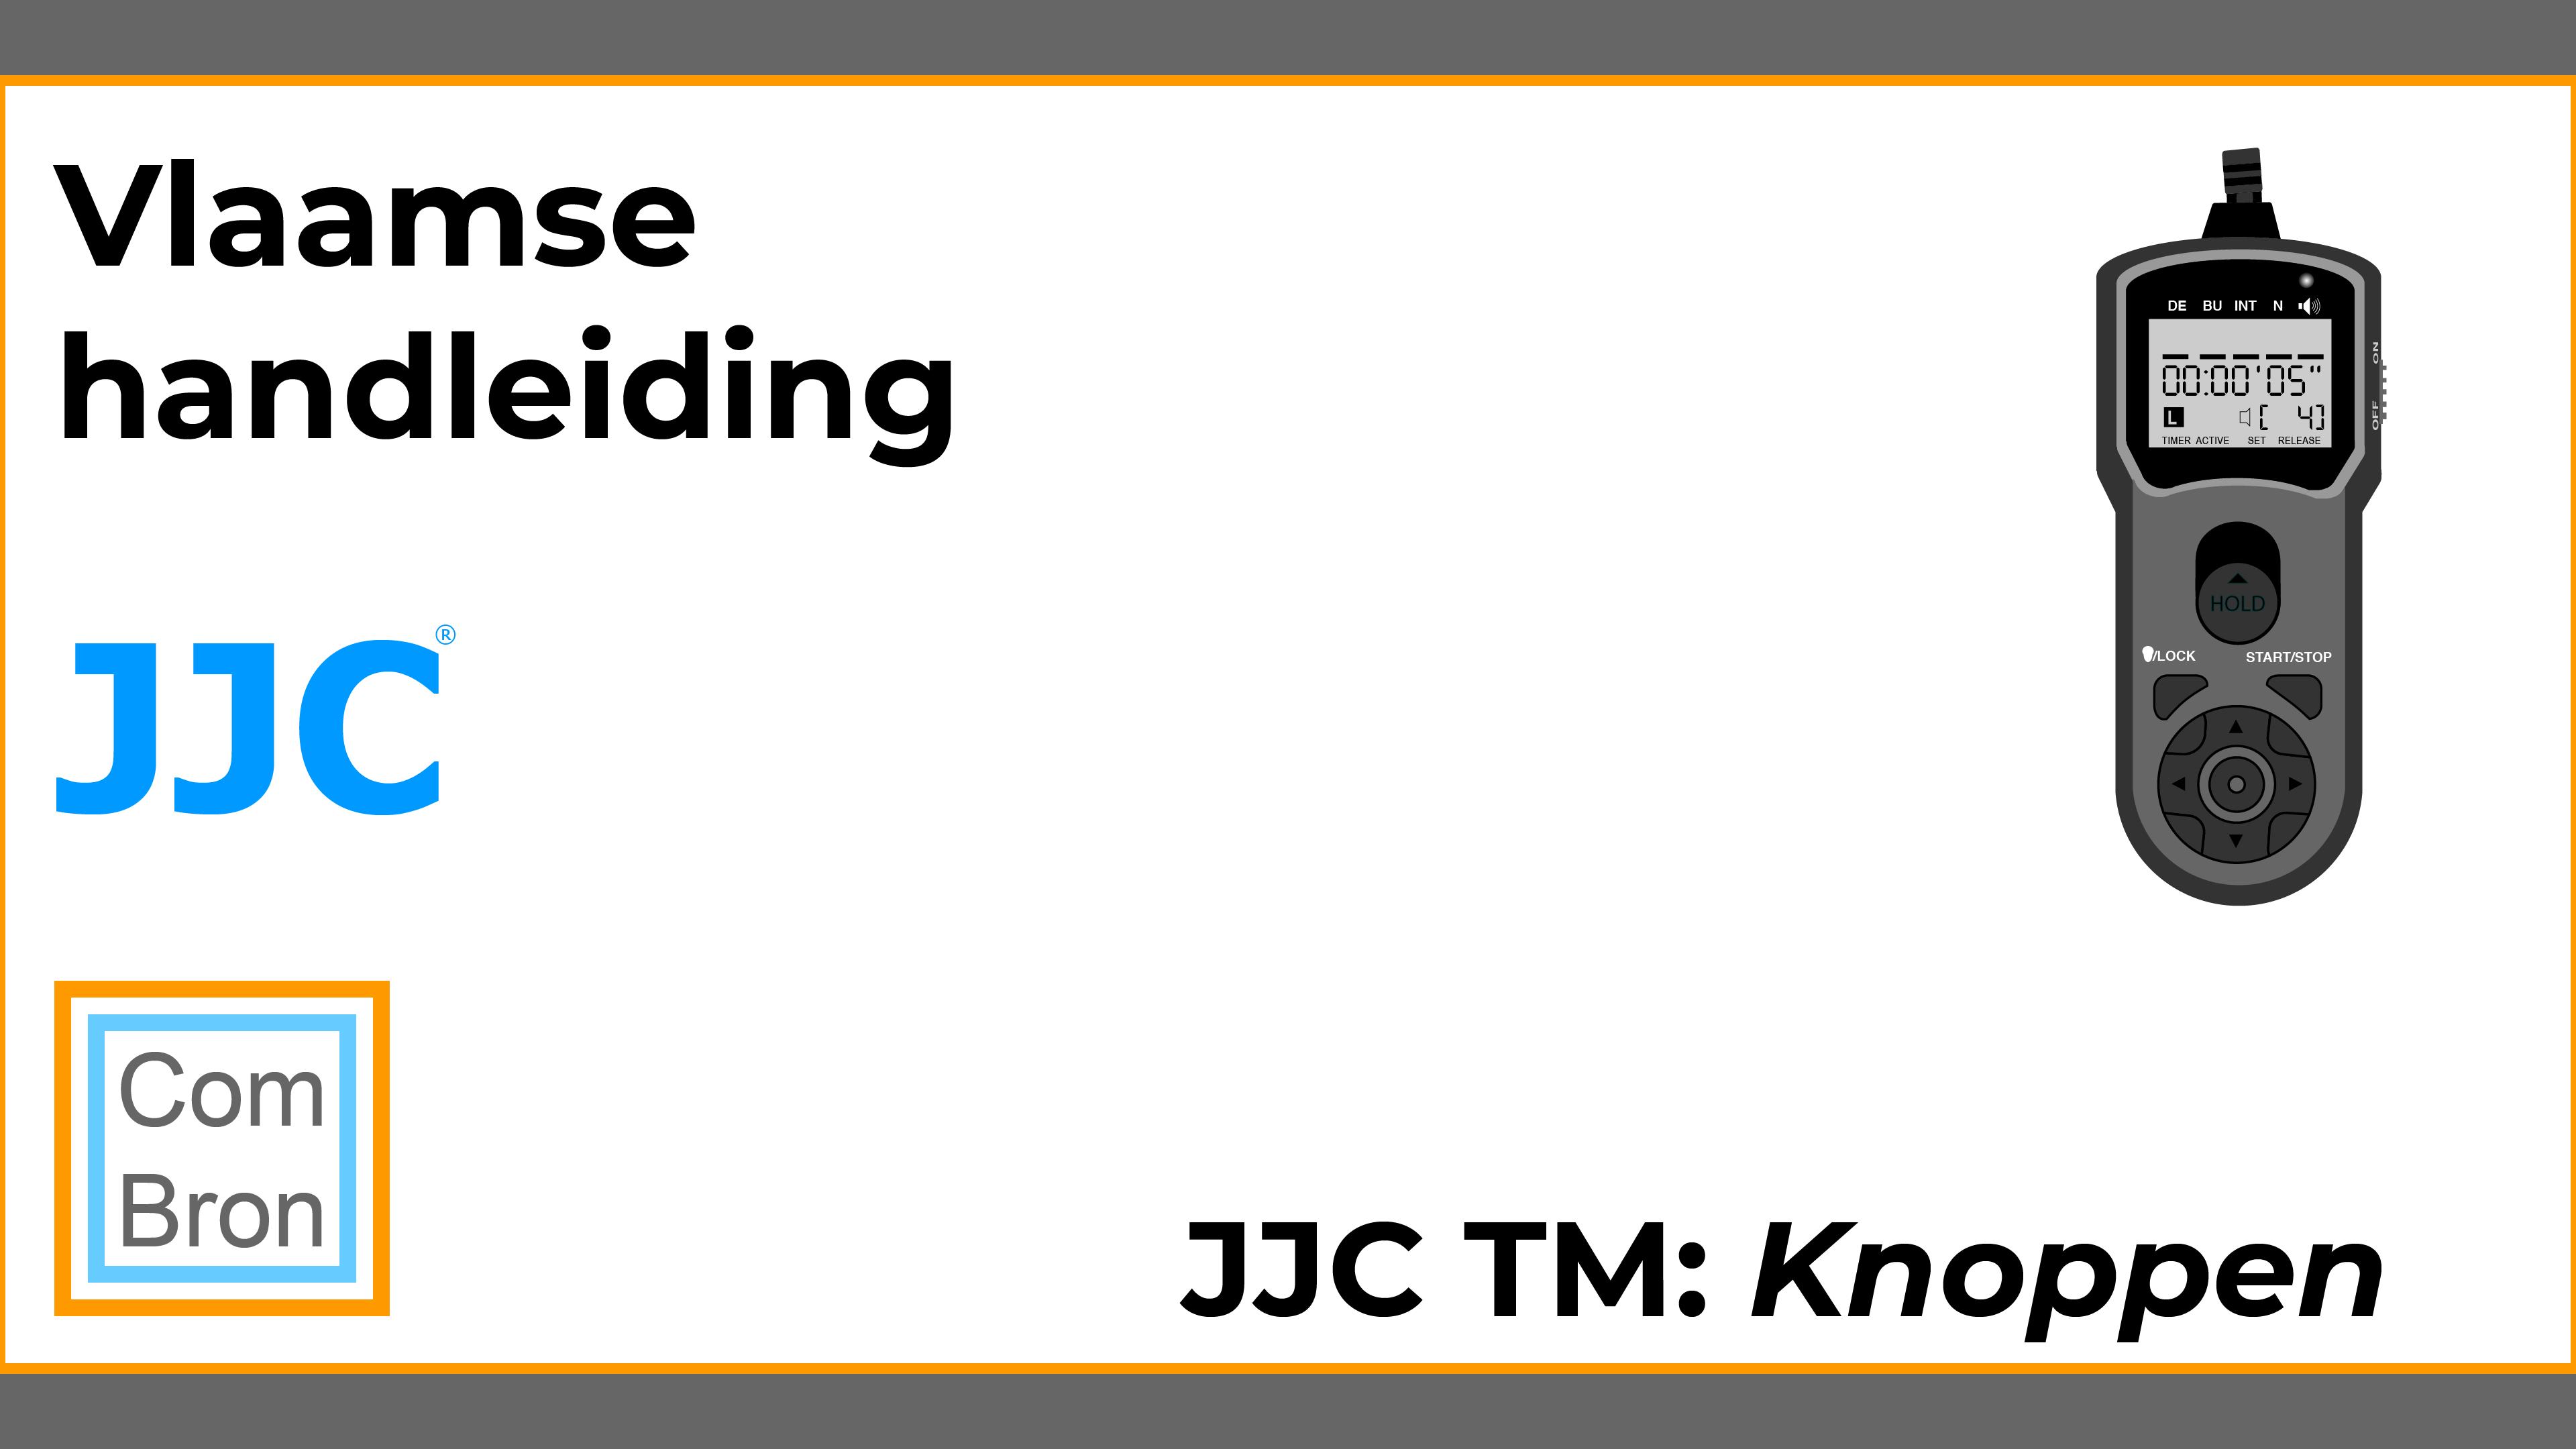 JJC TM functie en toepassing knoppen.